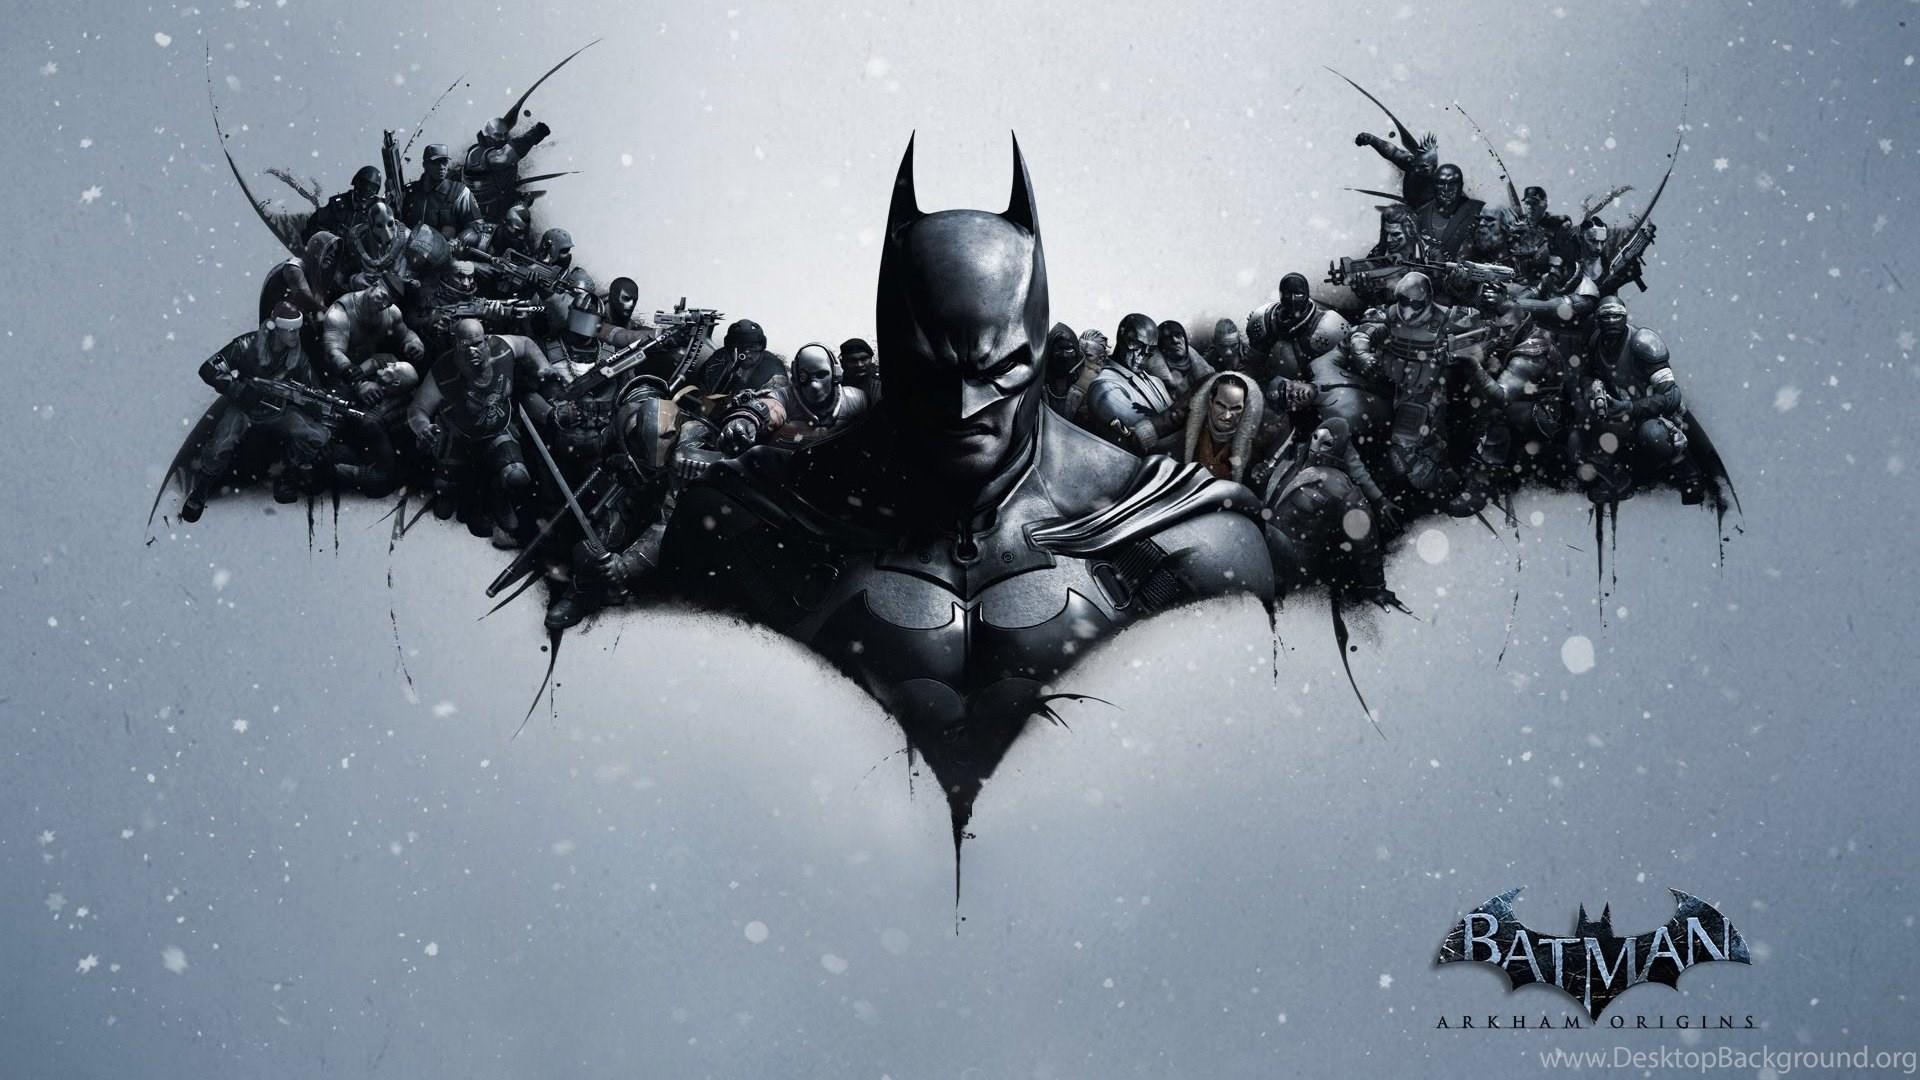 Batman Symbol In The Sky Wallpaper Desktop Background